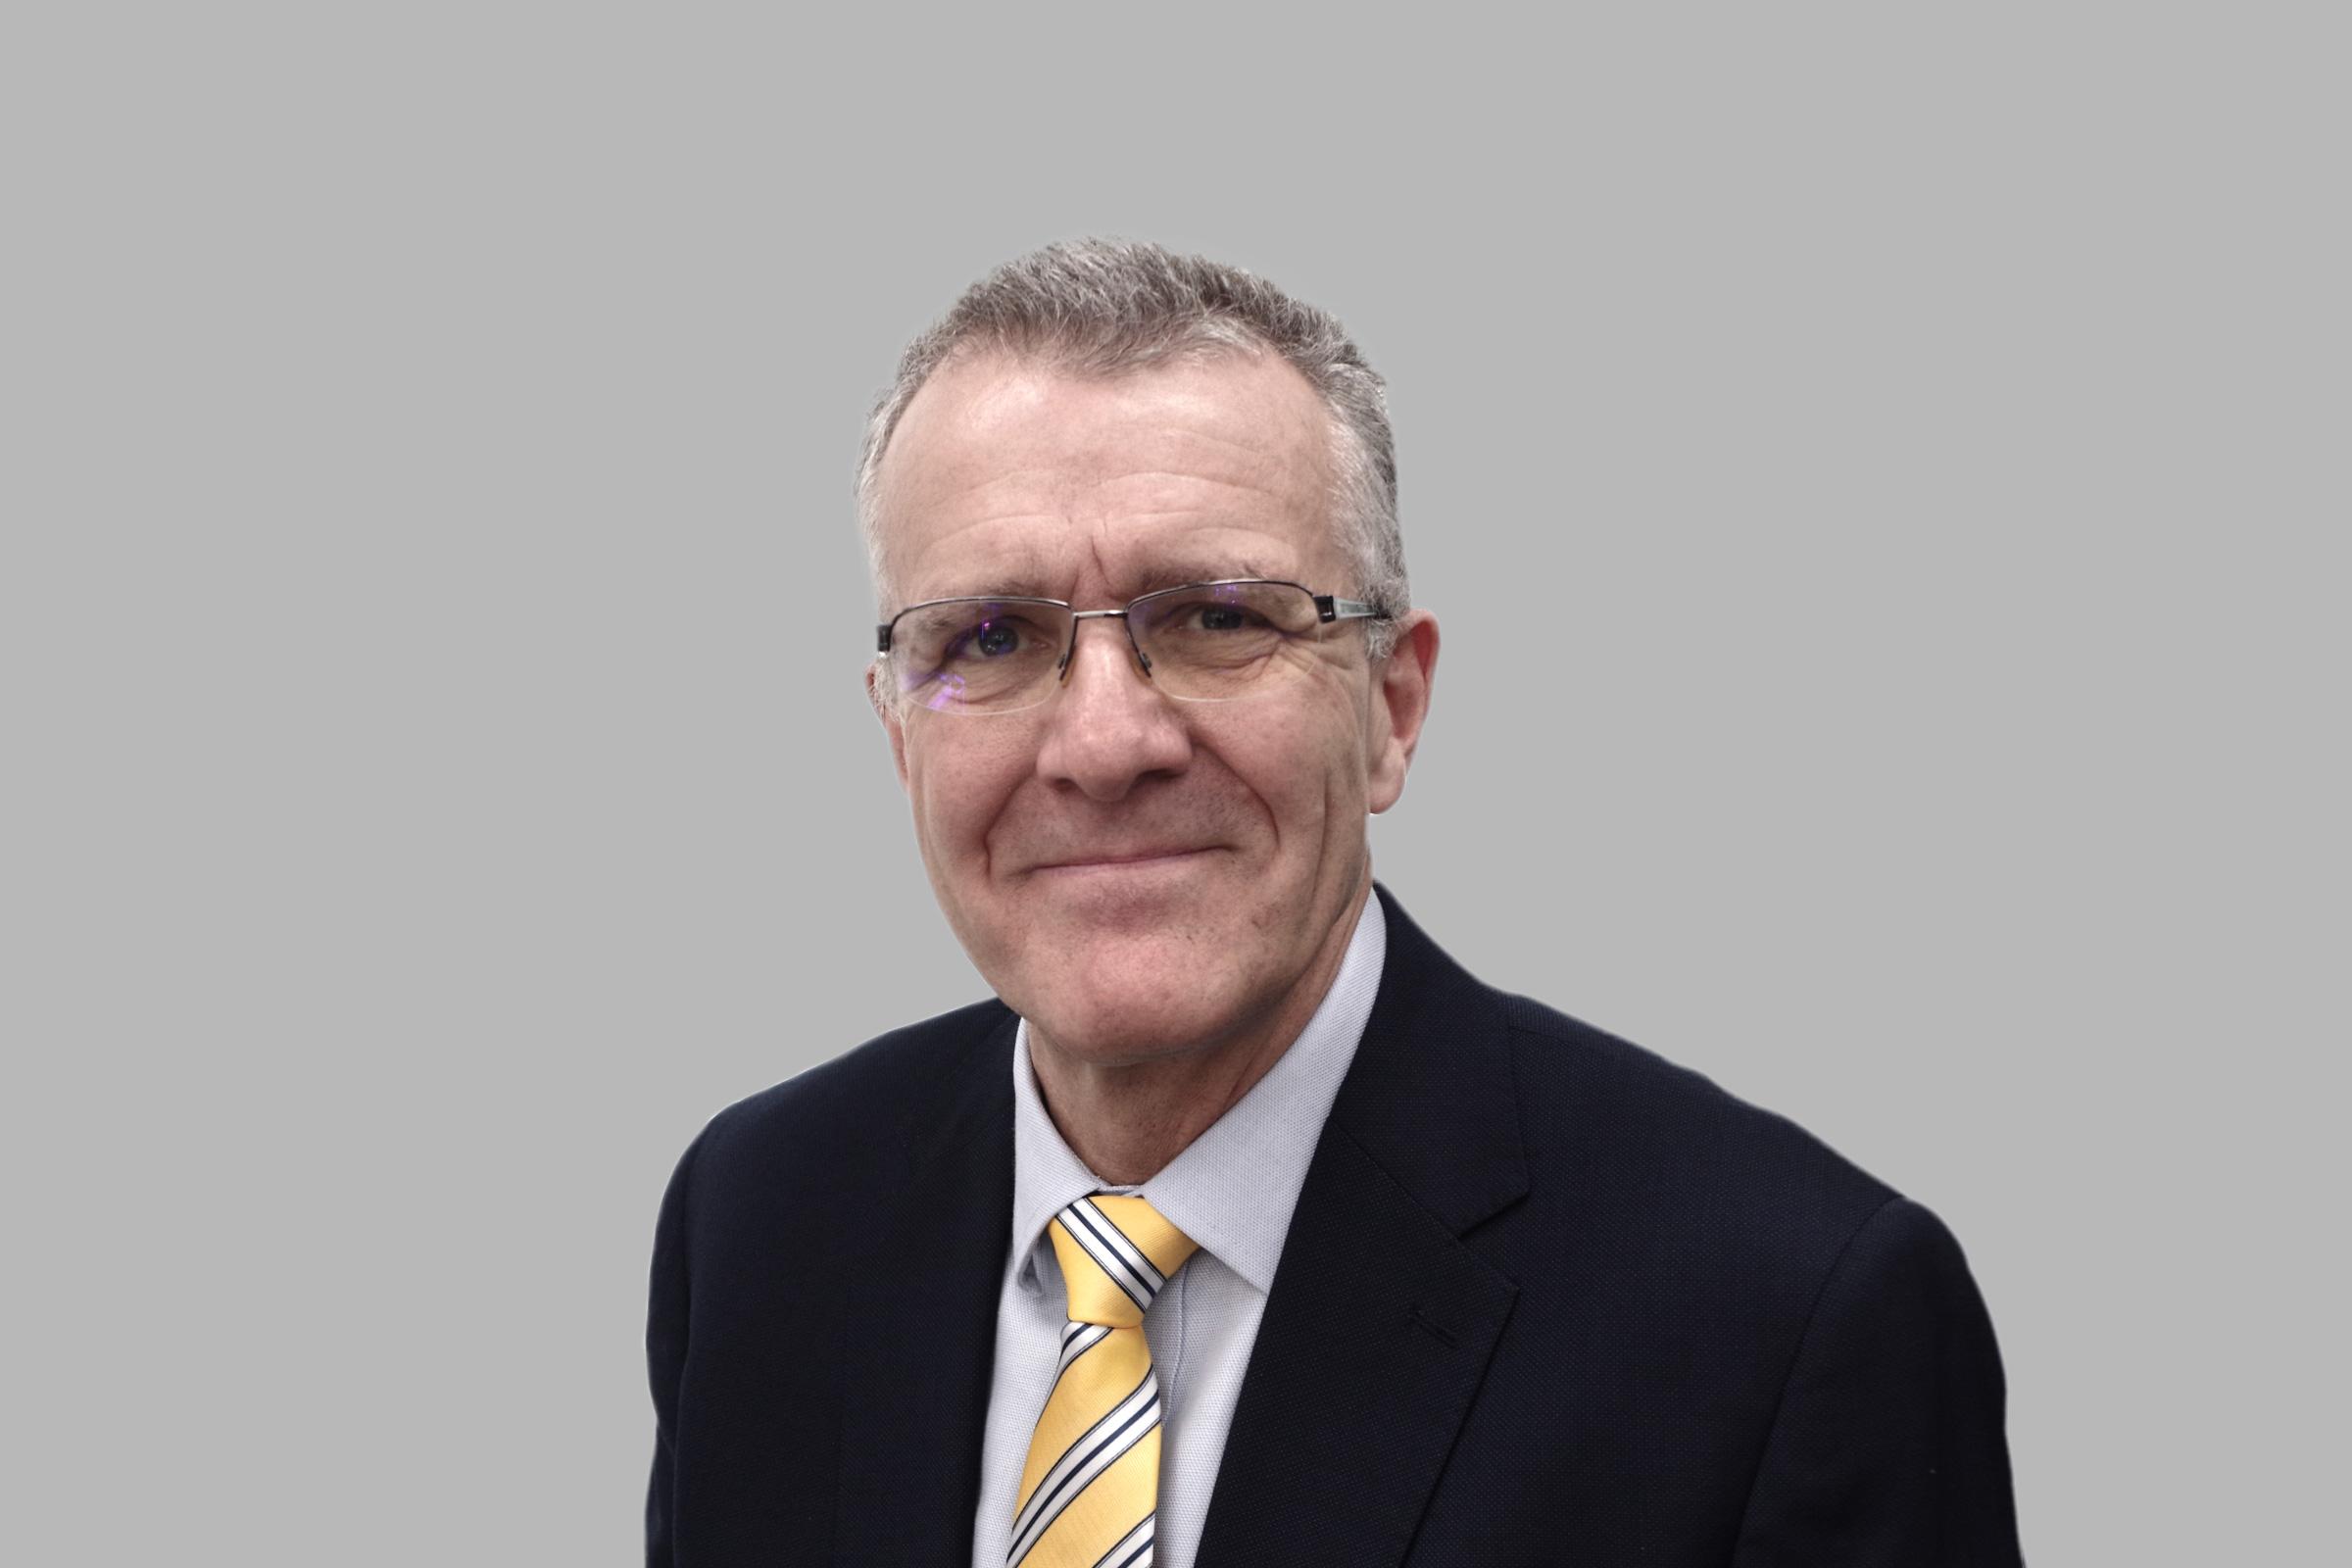 Tim Markham